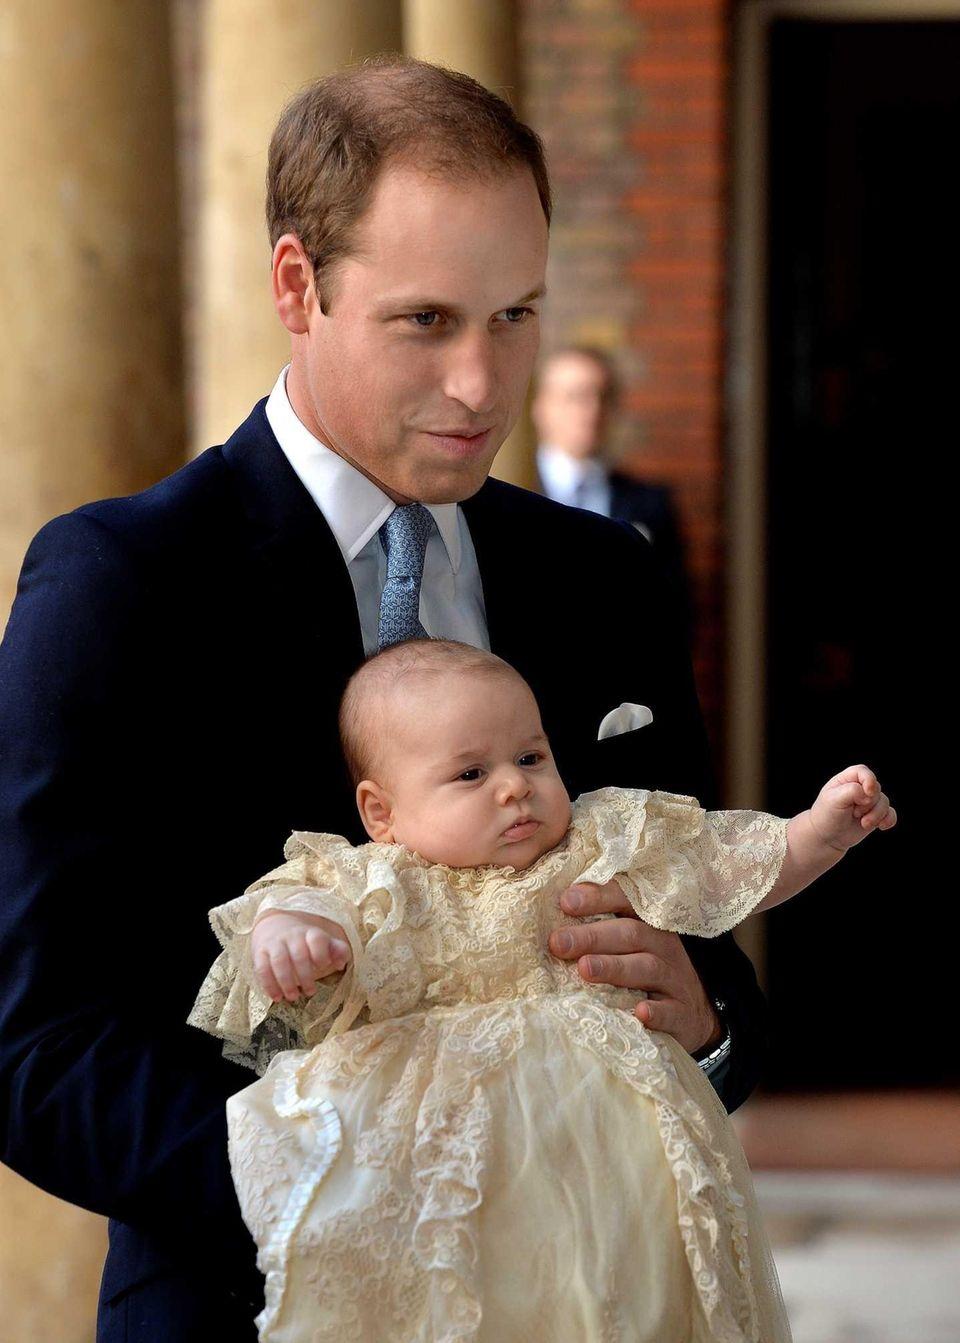 Prince William, Duke of Cambridge arrives, holding his